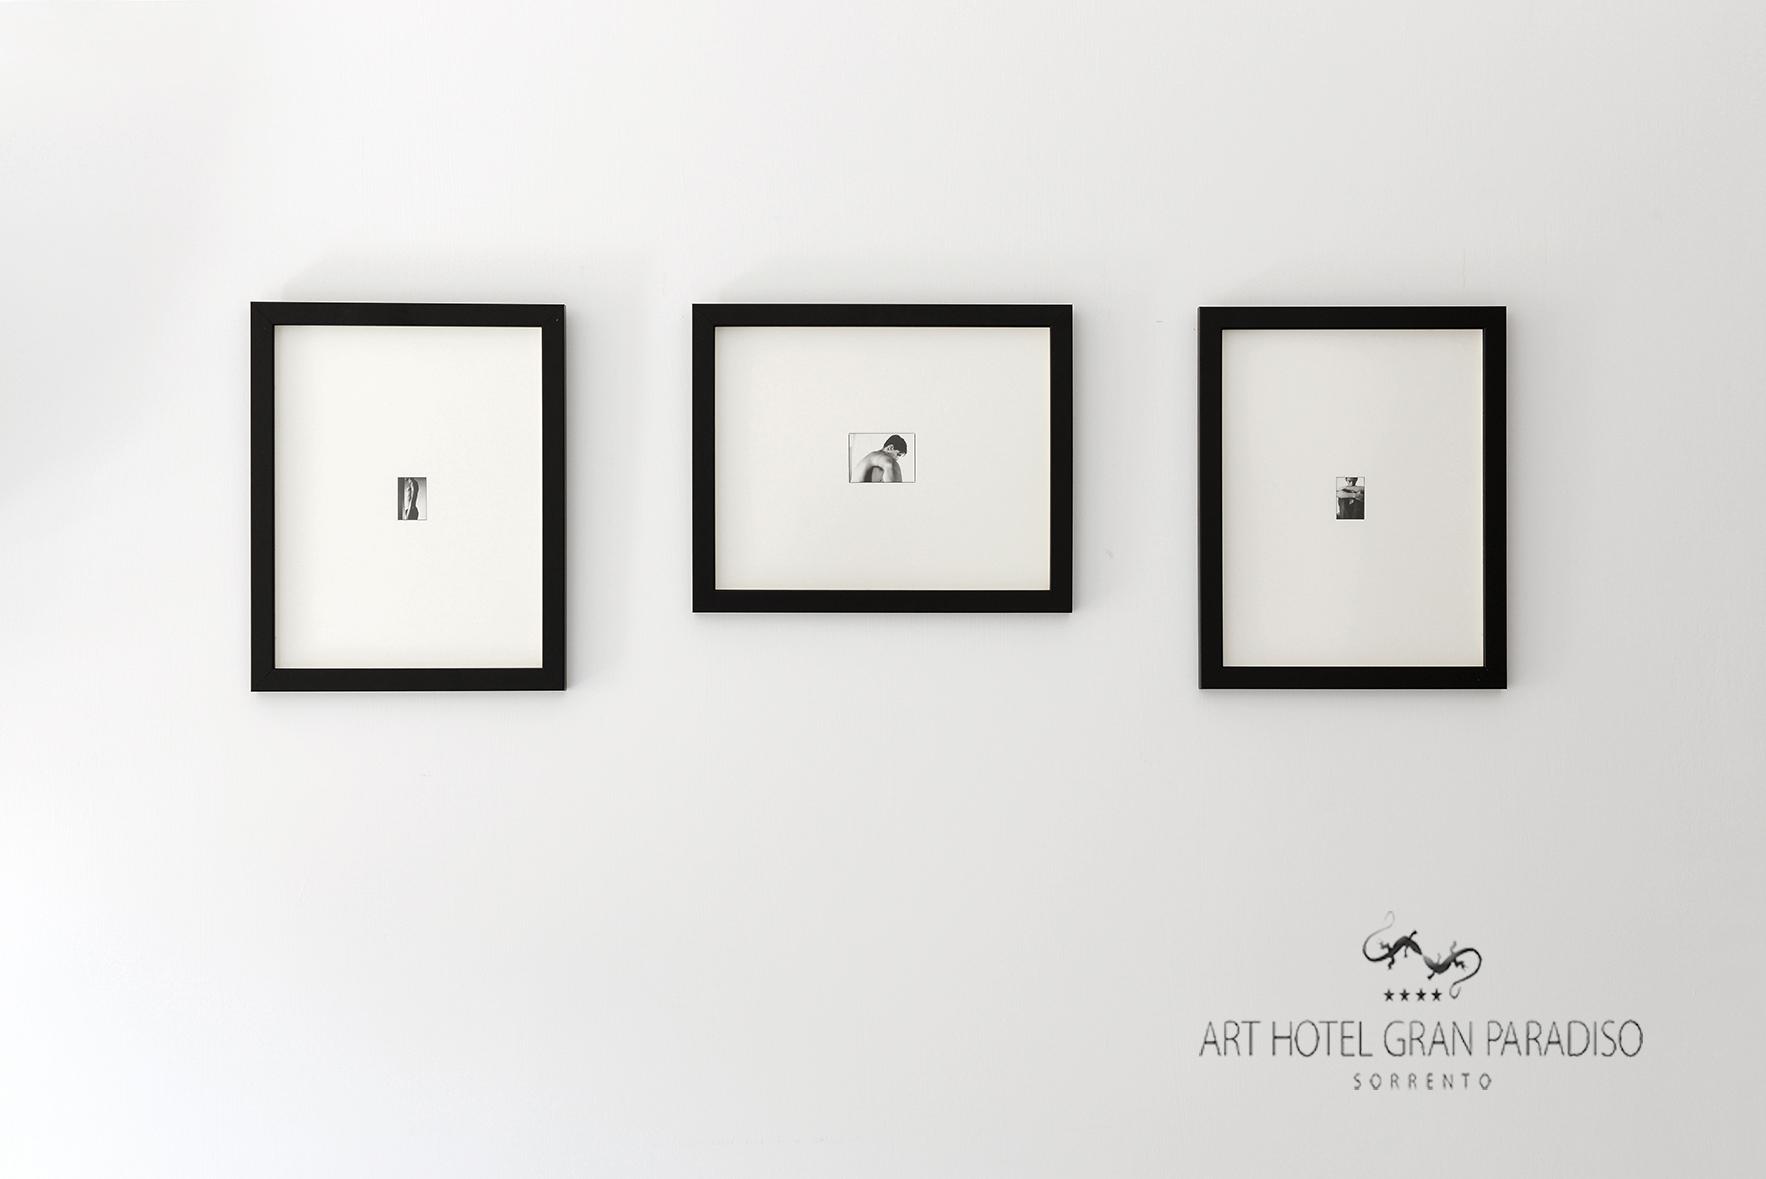 Art_Hotel_Gran_Paradiso_2013_412_Luca_Massimo_Barbero_4.jpg